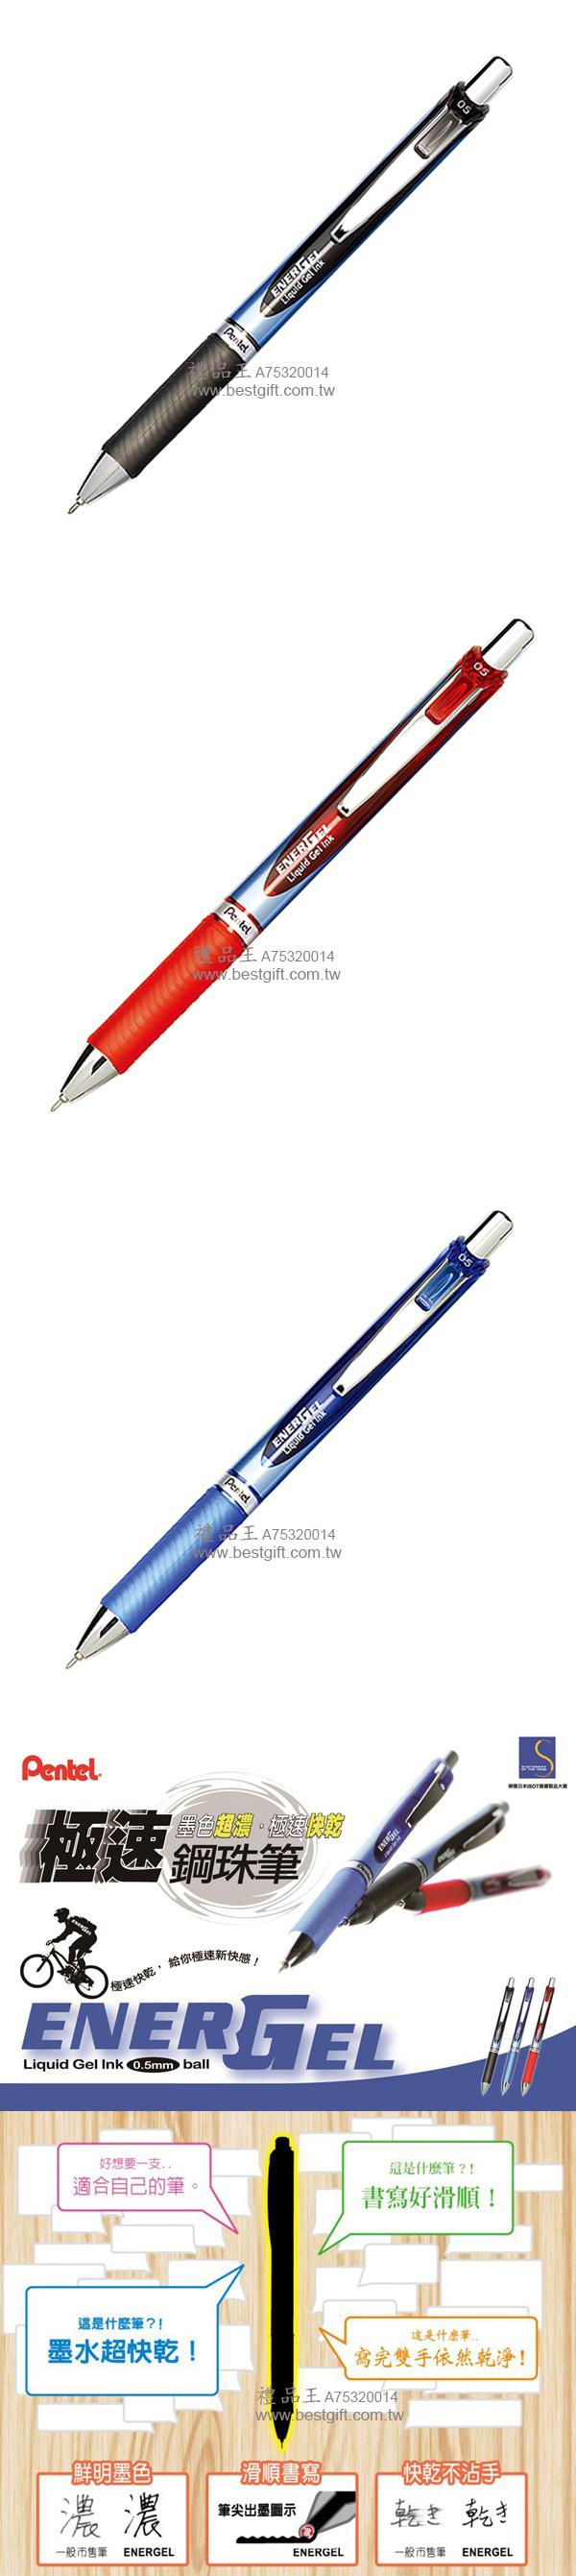 Pentel超濃快乾鋼珠筆(黑桿)   商品貨號 : A75320014